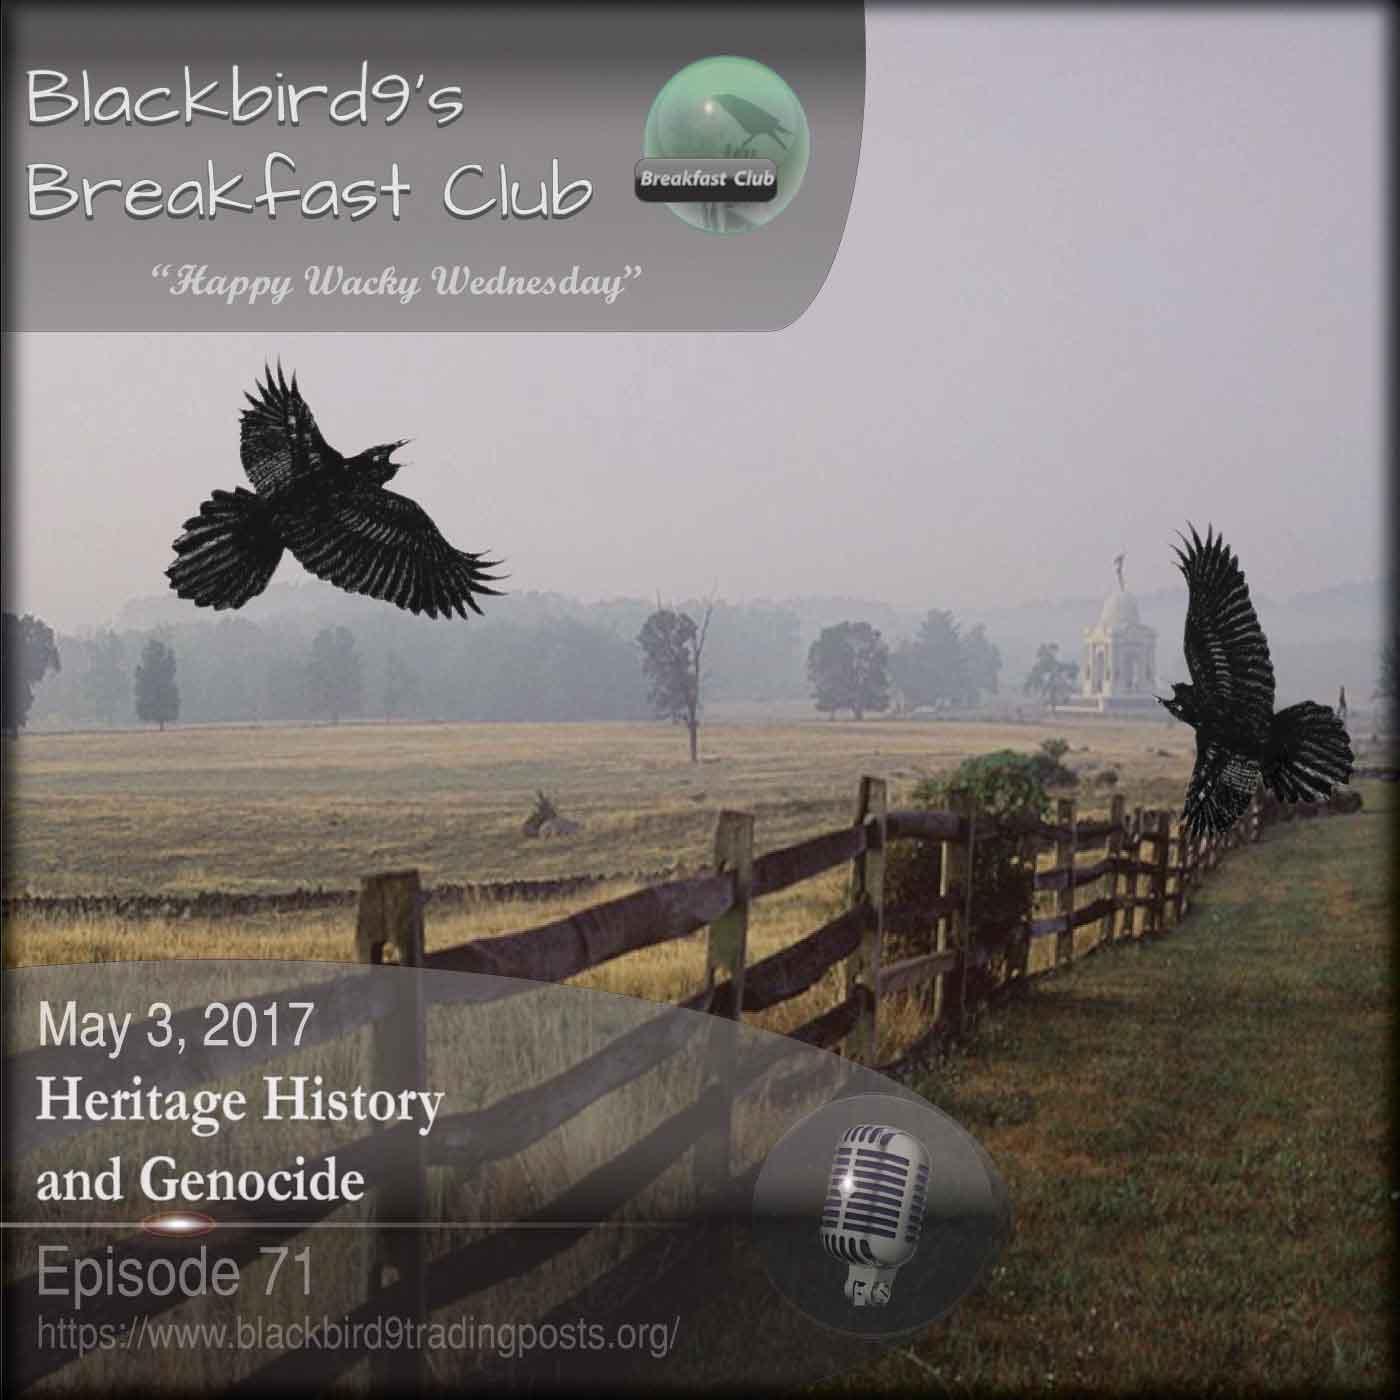 Heritage, History and Genocide  - Blackbird9